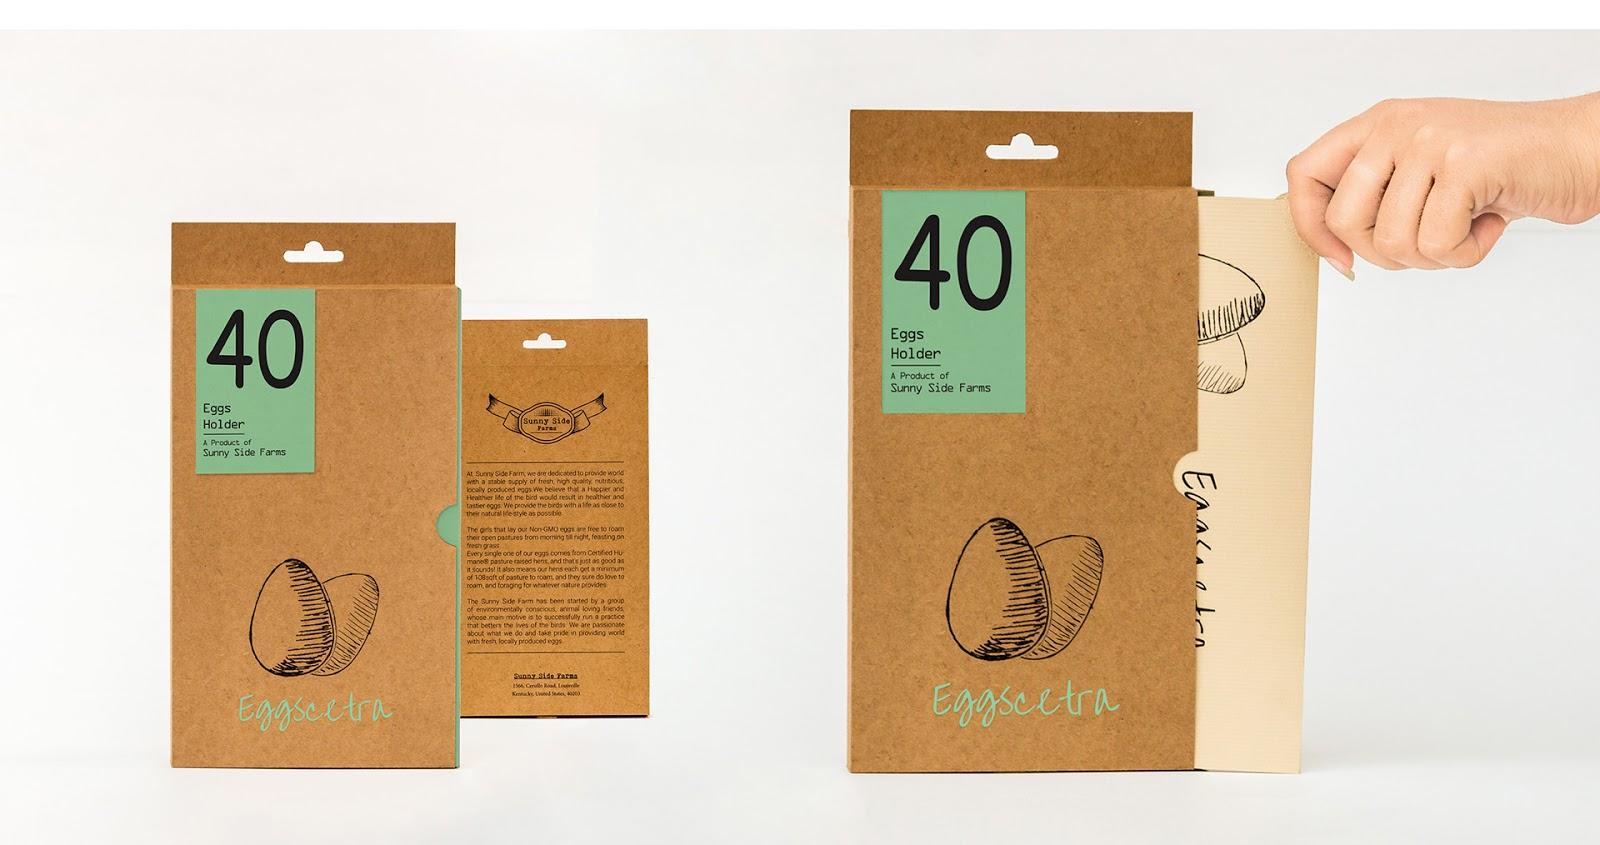 Eggscetra 蛋品创意包装6